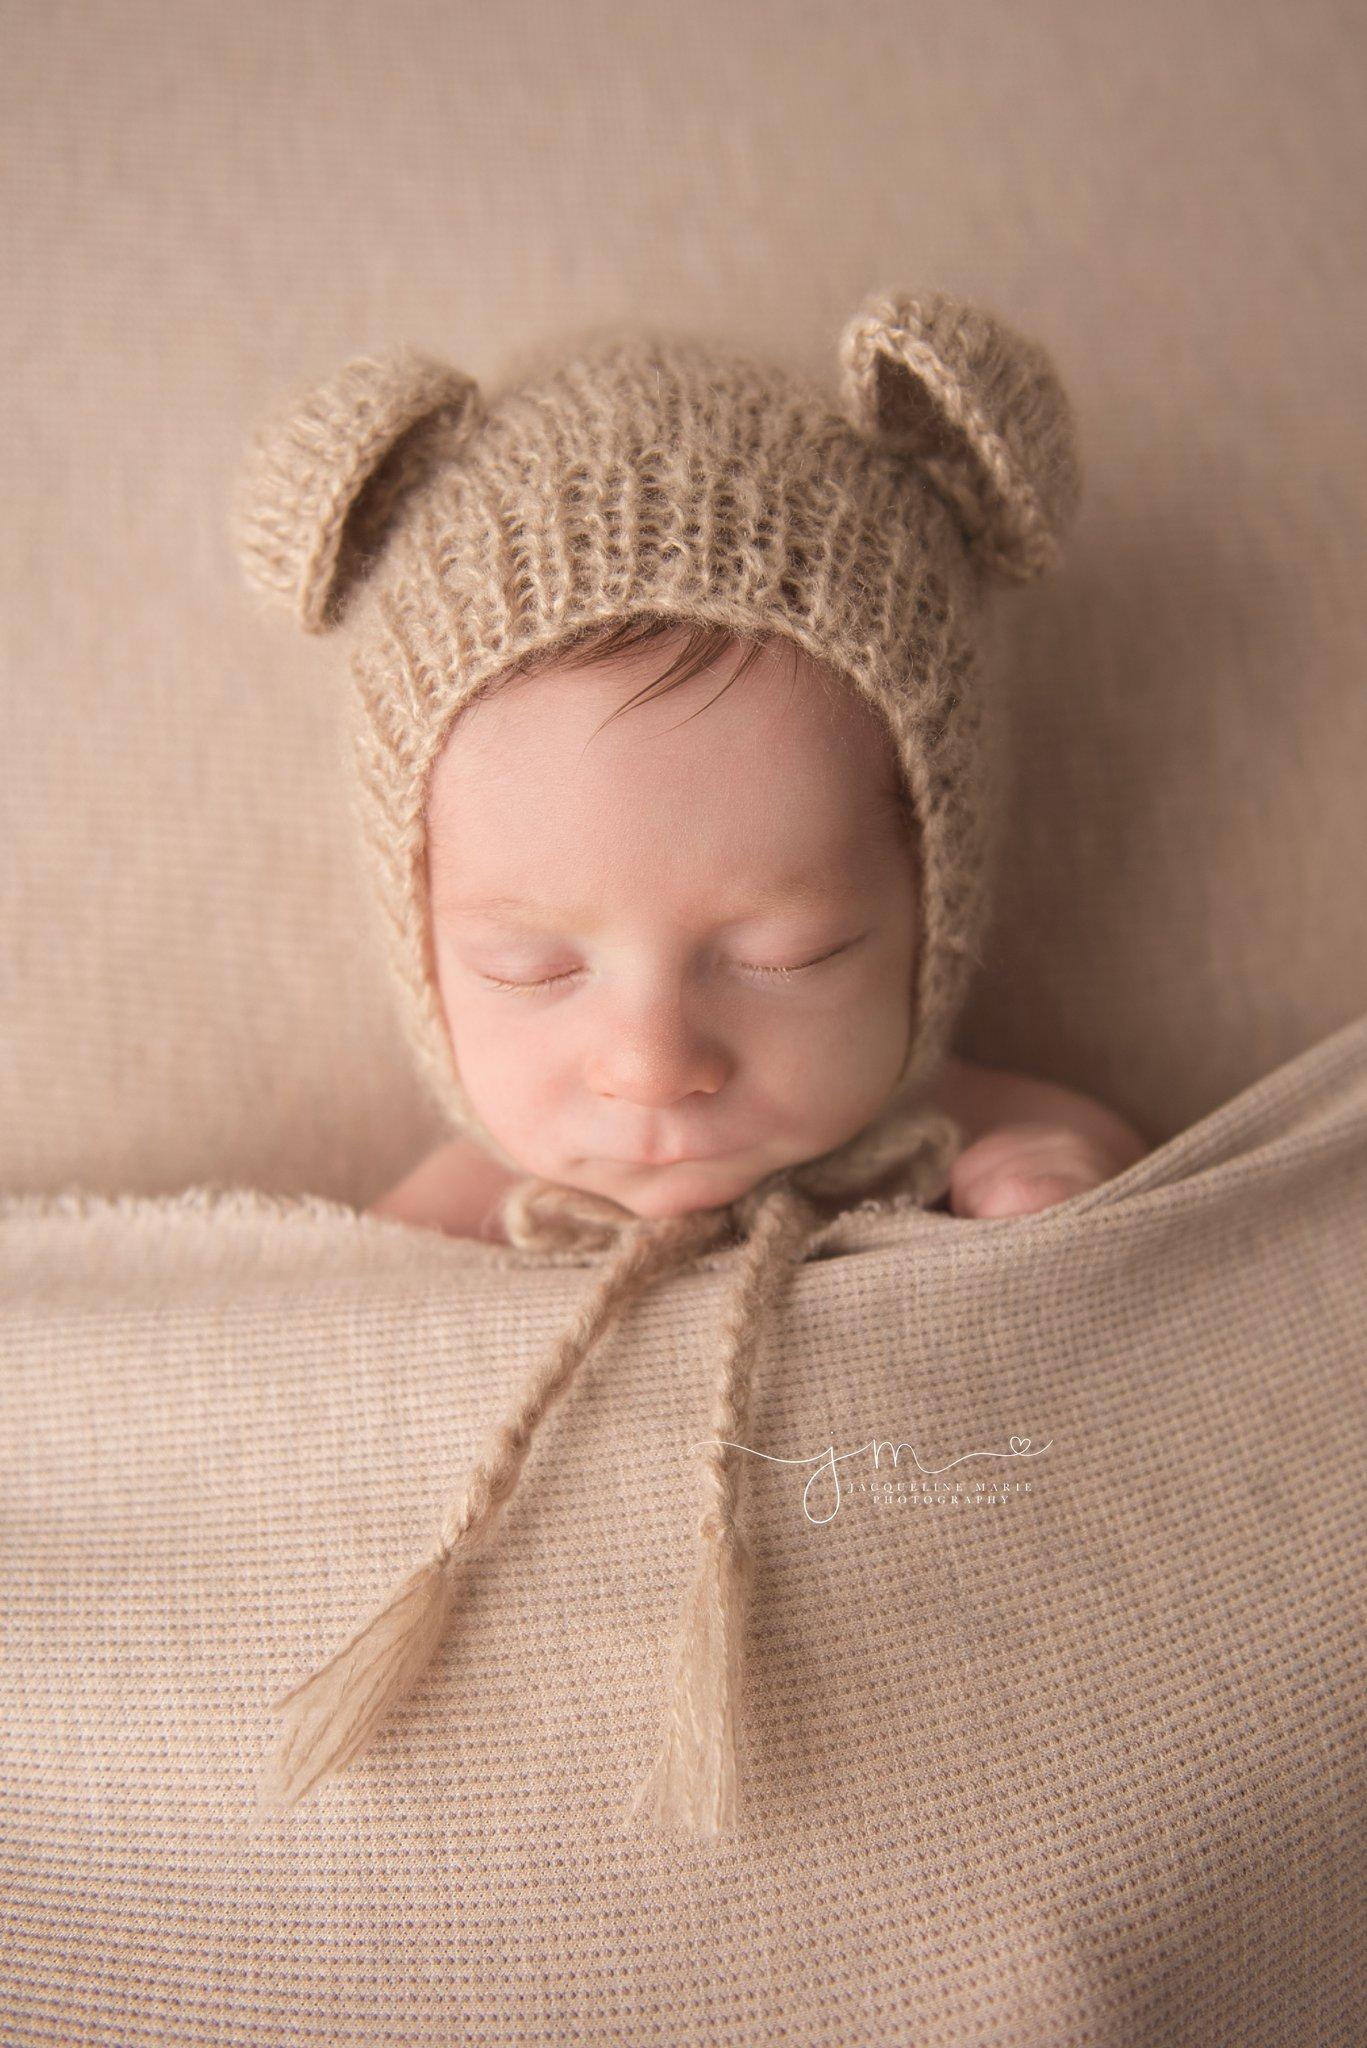 columbus ohio newborn baby features features portraits of baby boy wearing teddy bear bonnet at newborn portrait studio